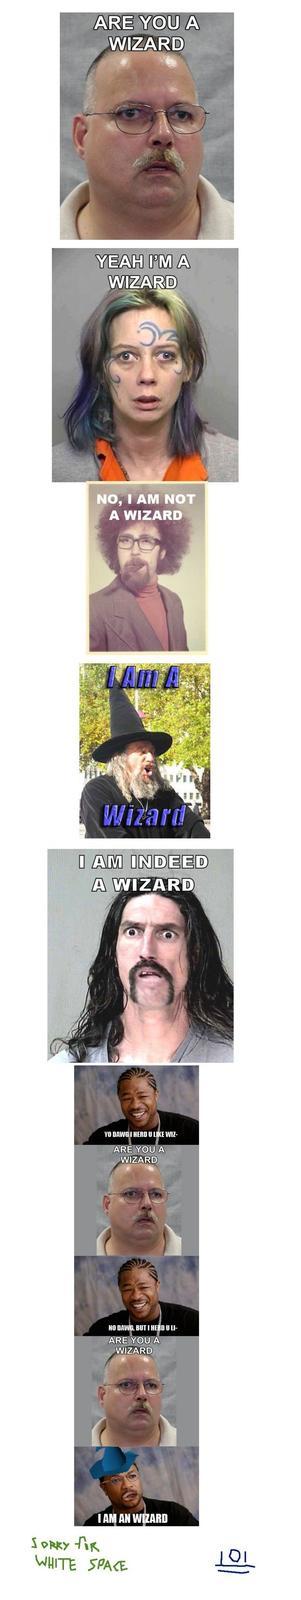 wizard110.jpg